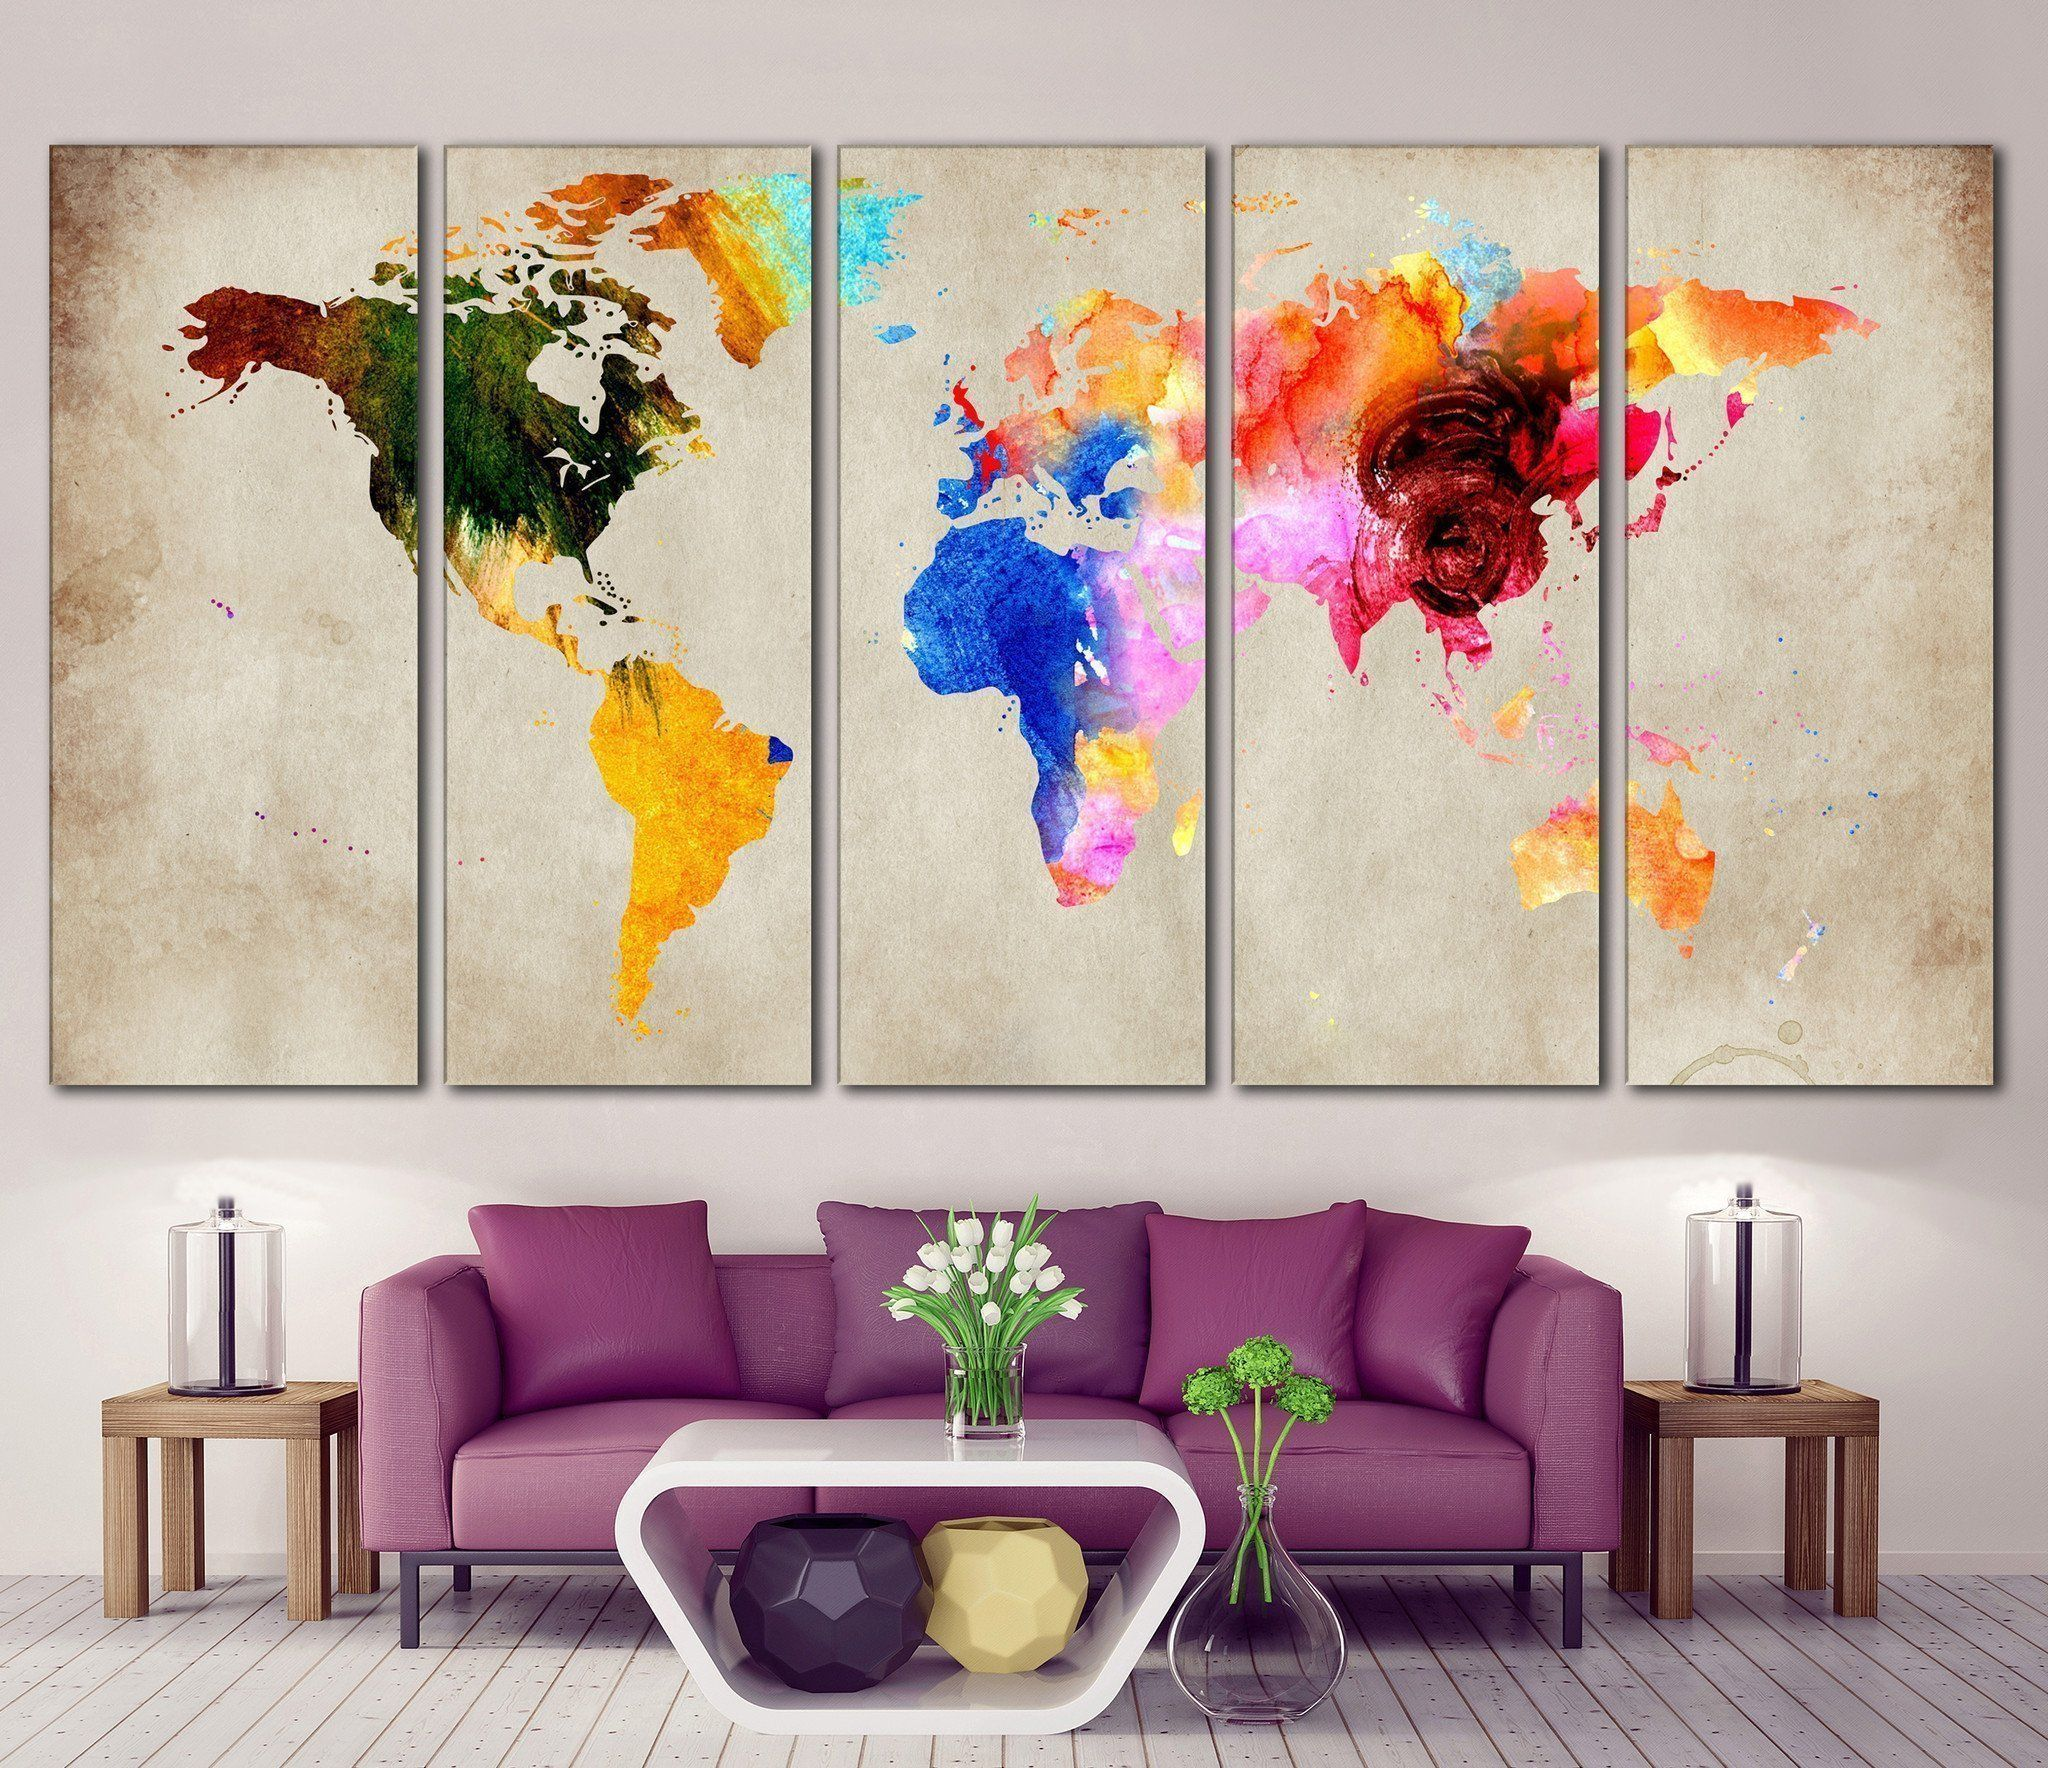 Colorful world map 870 bachelorette pad pinterest apartment colorful world map 870 gumiabroncs Choice Image